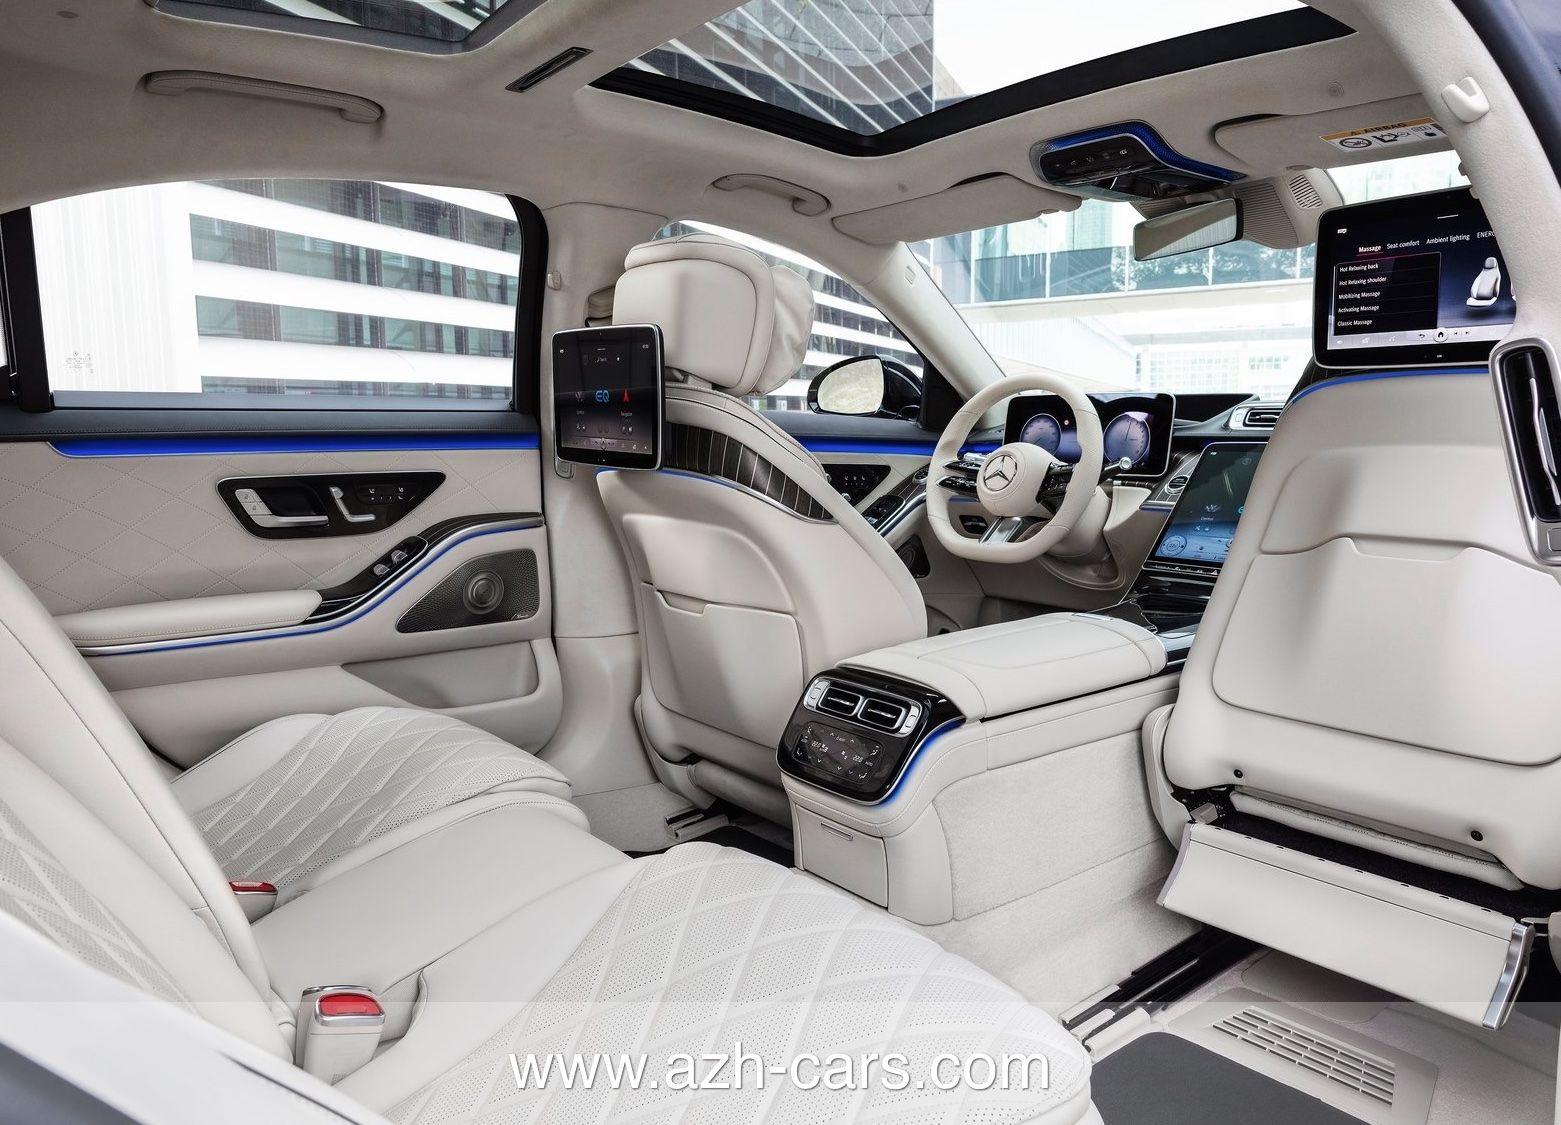 2021 Mercedes Benz S Class Plug In Hybrid W223 Azh Cars Benz S Class Benz S Mercedes S Class